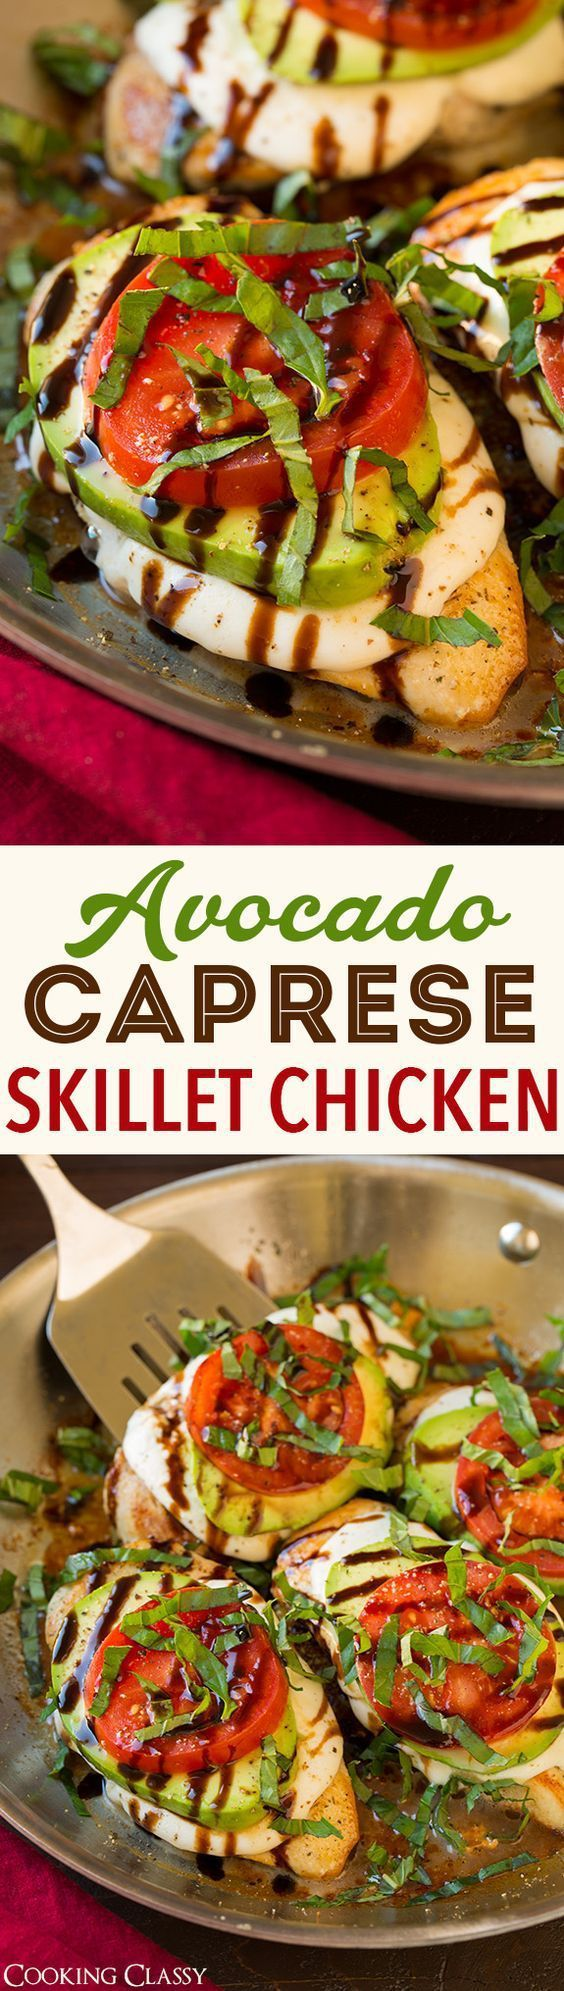 Hühnchen-Rezepte  #huhnchen #rezepte #chickenrecipes